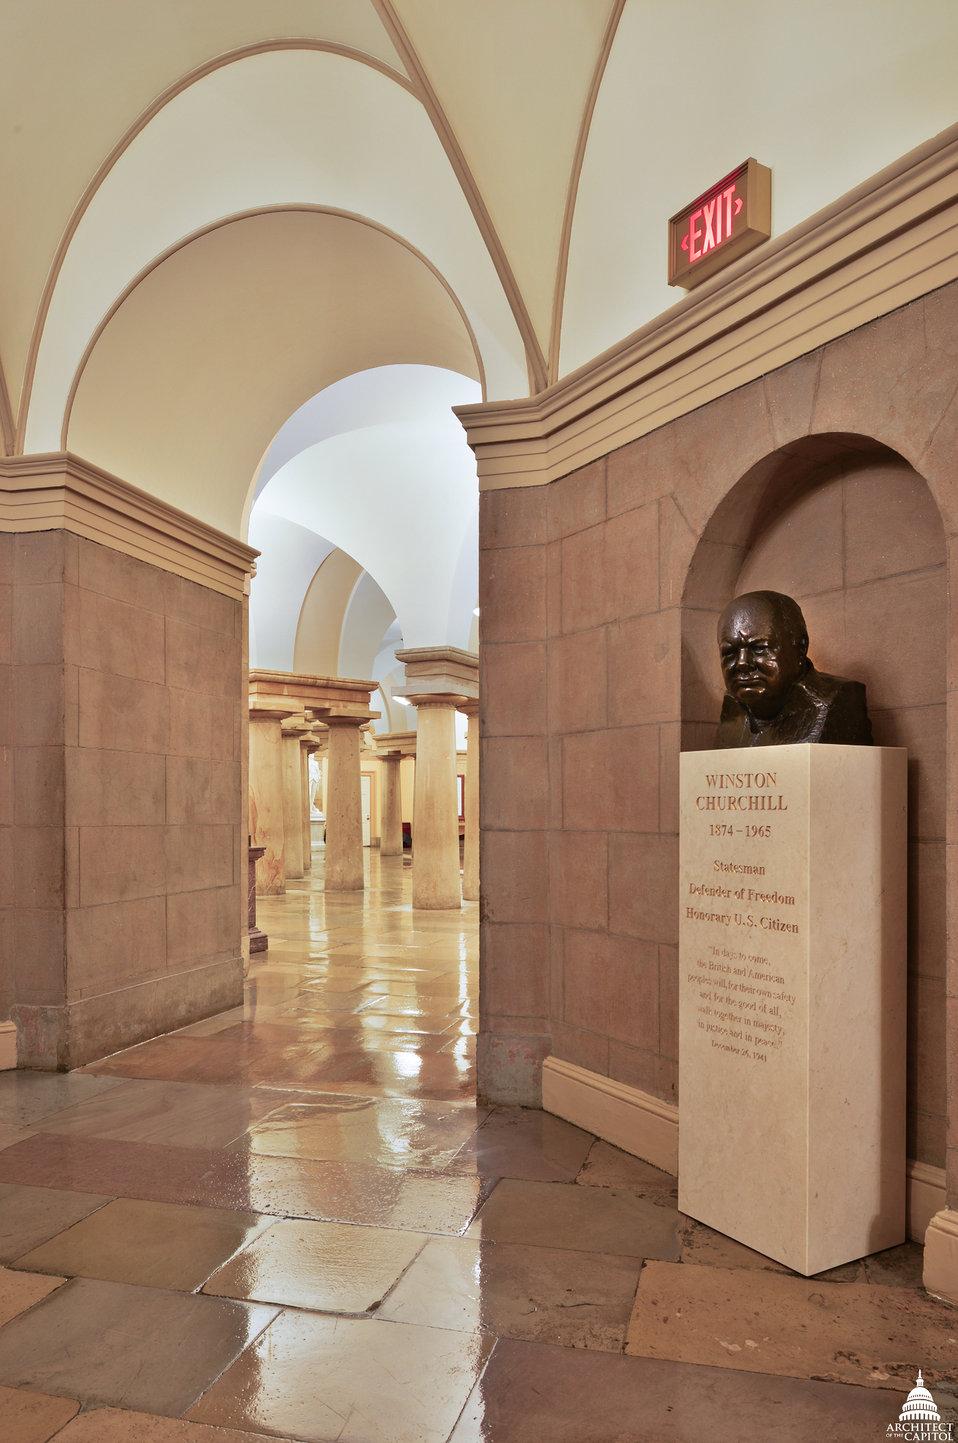 Winston Churchill Bust in Small House Rotunda